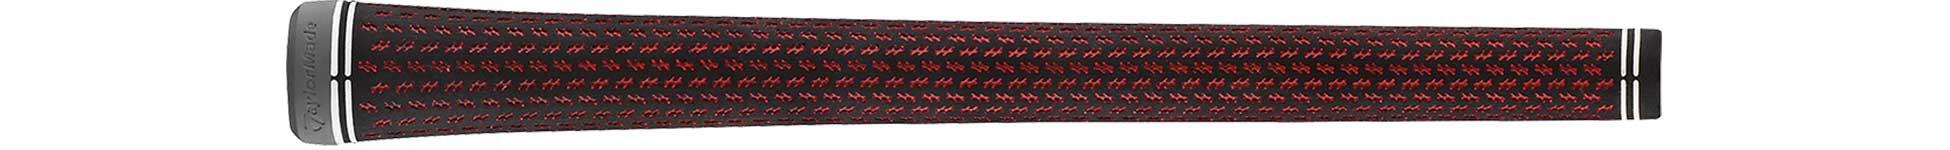 Crossline 360 Black/Red